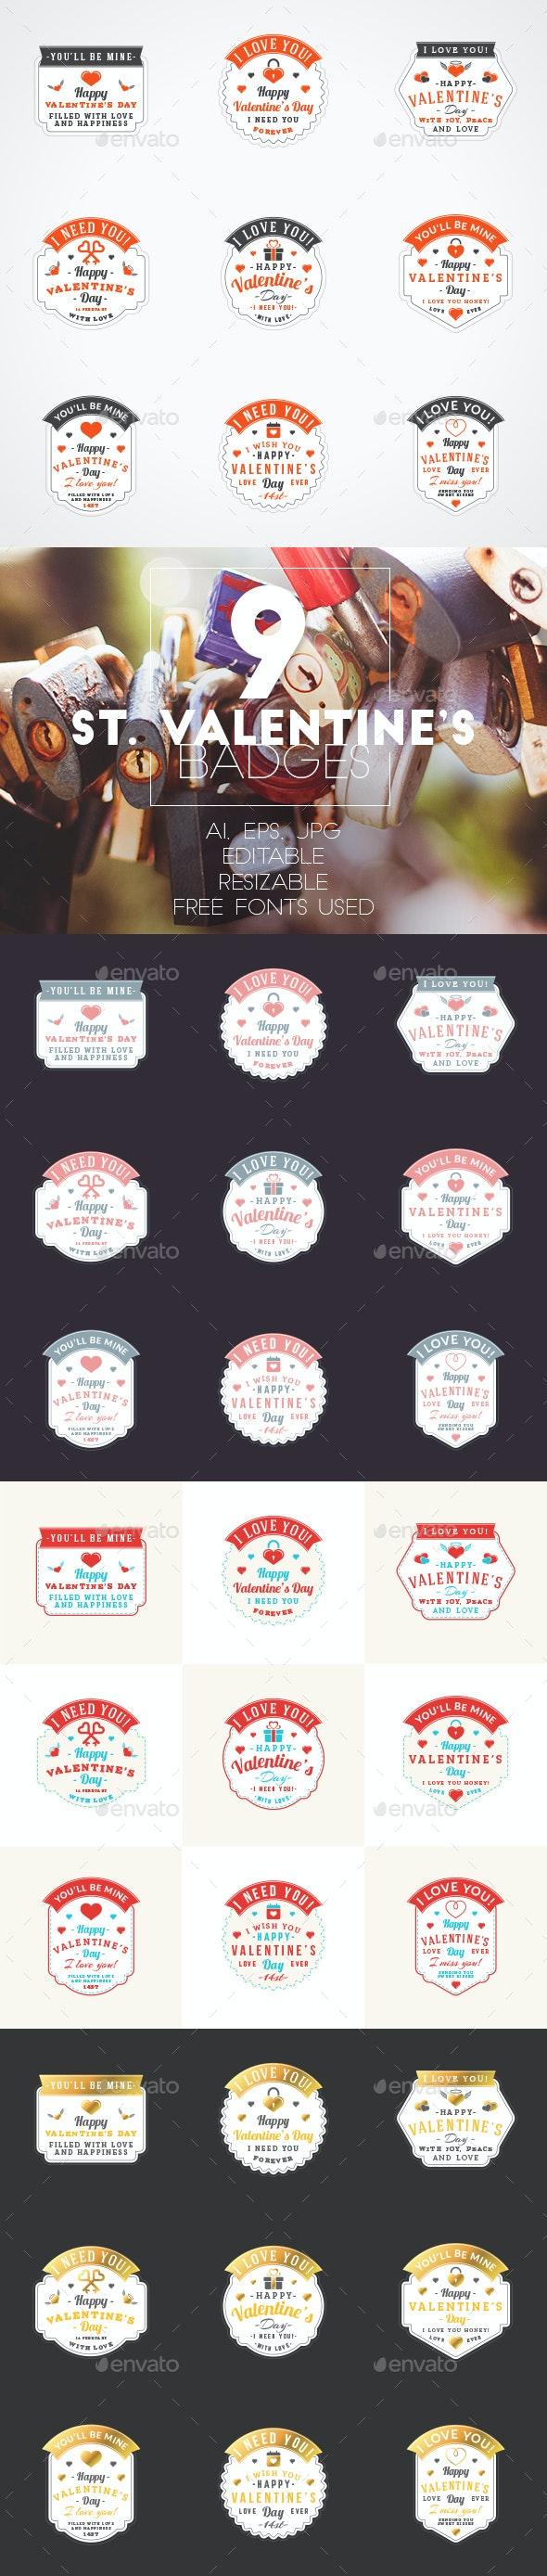 Set of 9 St. Valentine's Badges - Badges & Stickers Web Elements